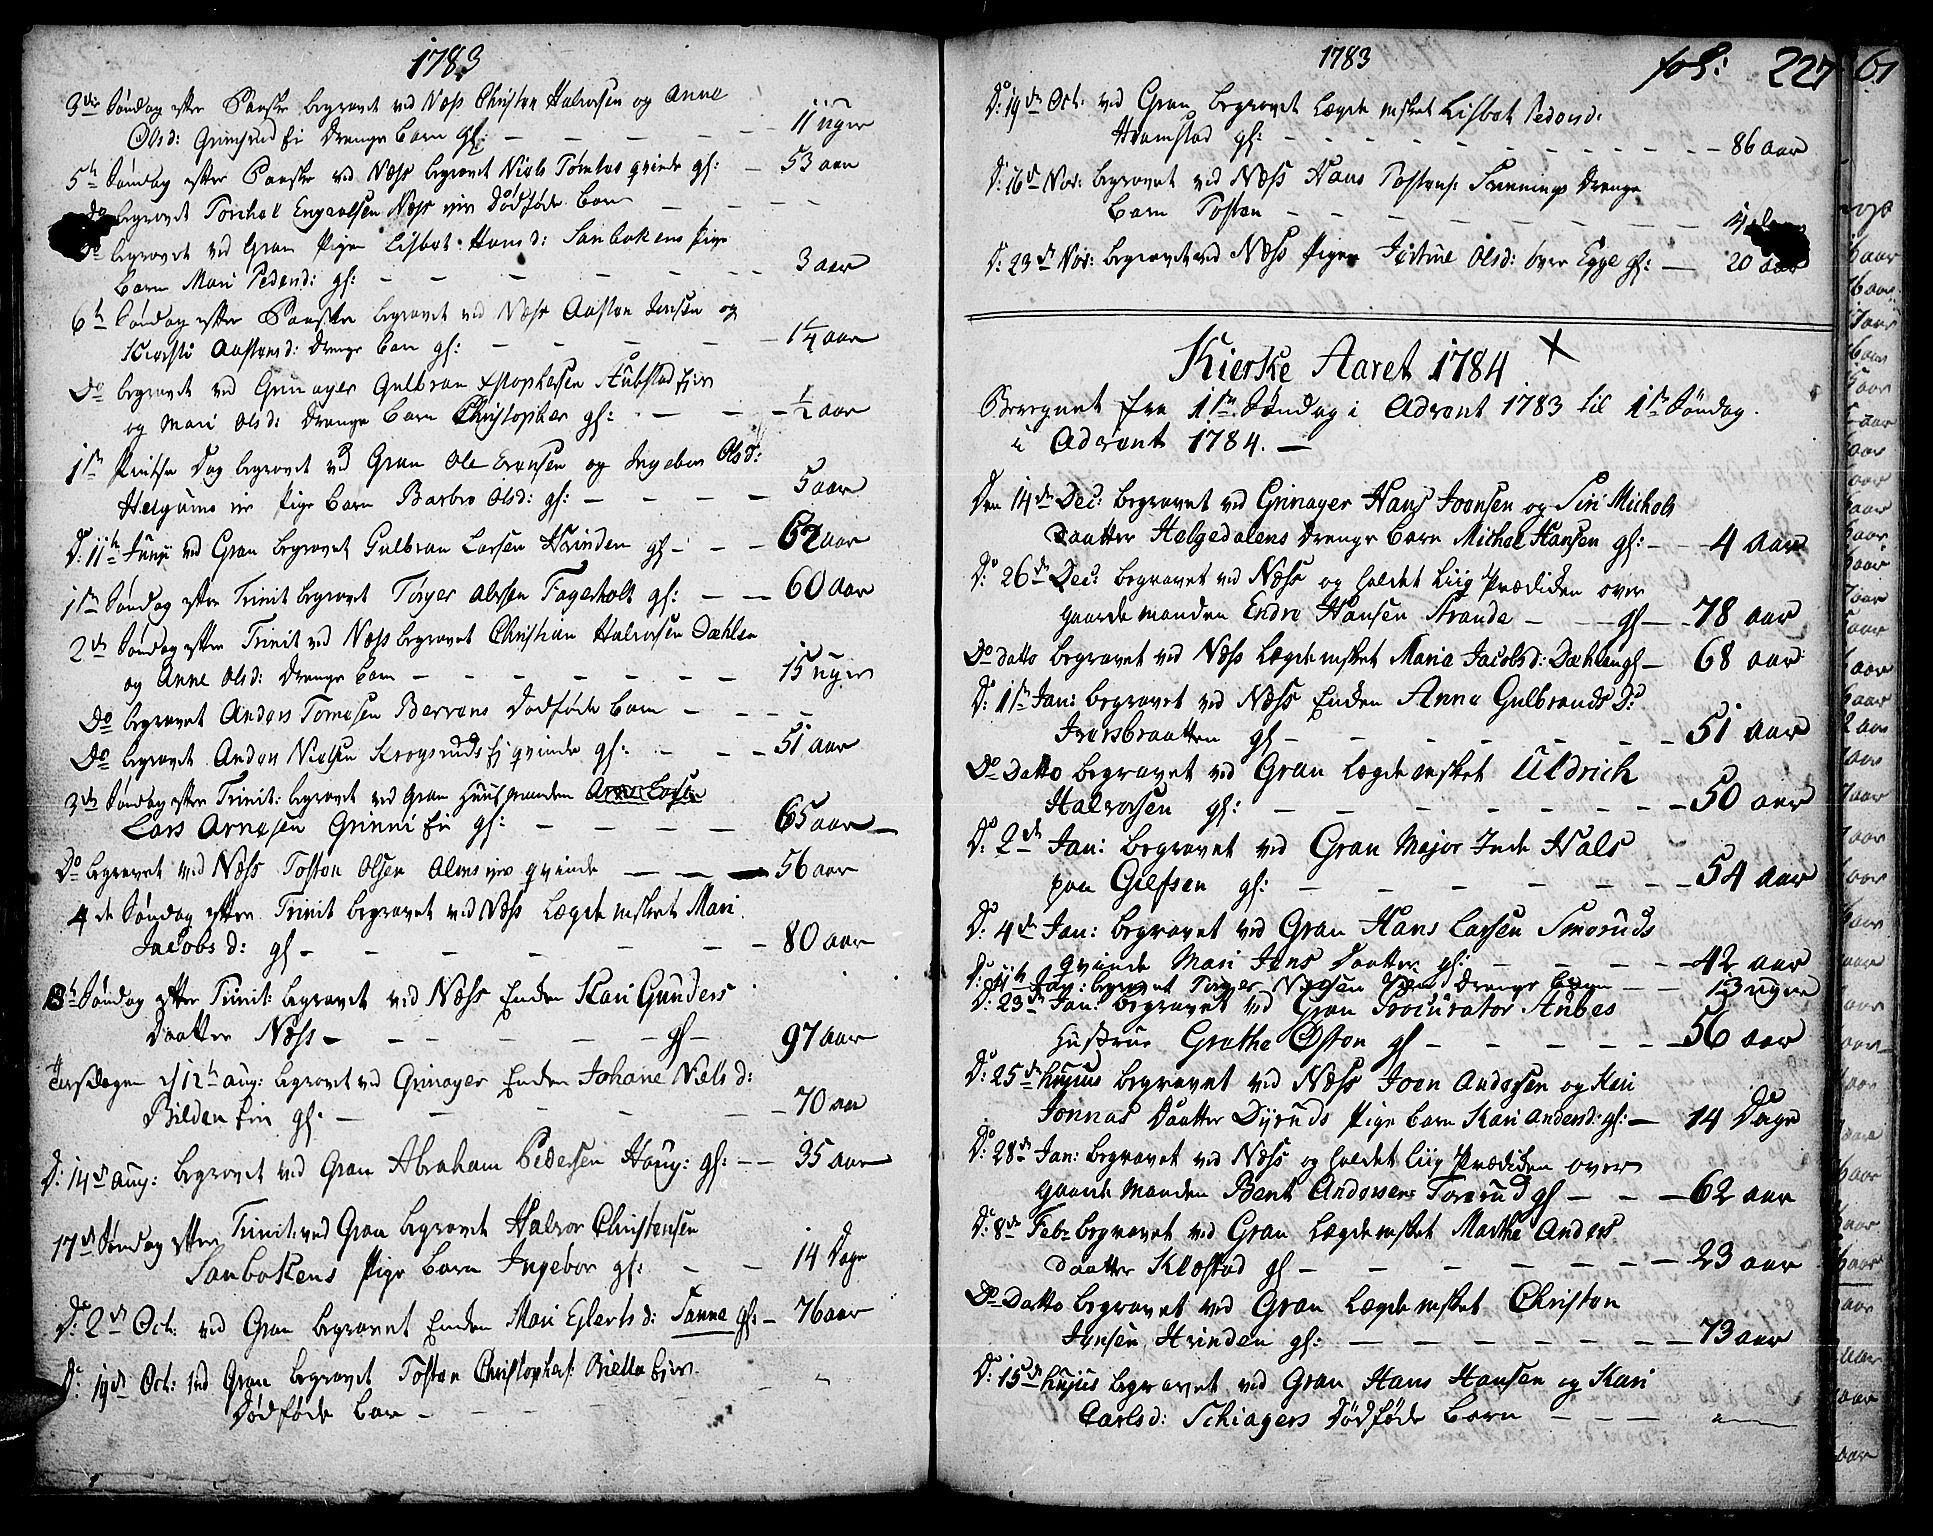 SAH, Gran prestekontor, Ministerialbok nr. 5, 1776-1788, s. 227